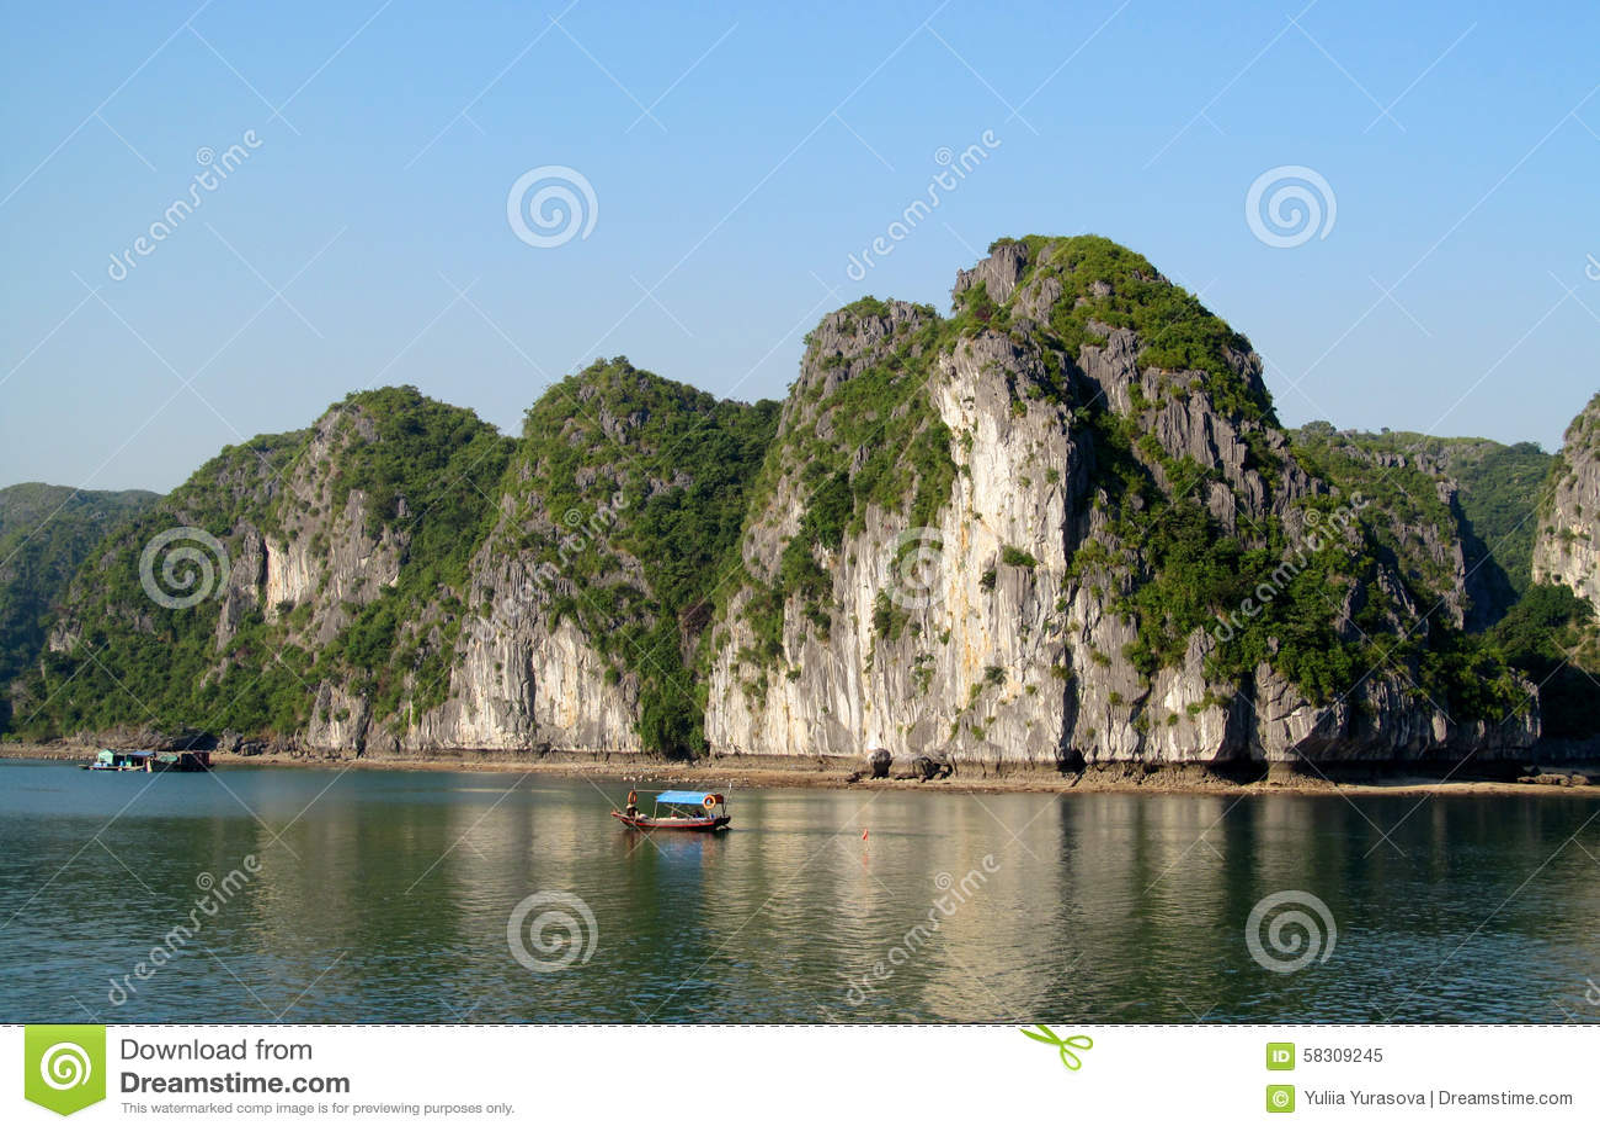 Limestone island and boat in the sea